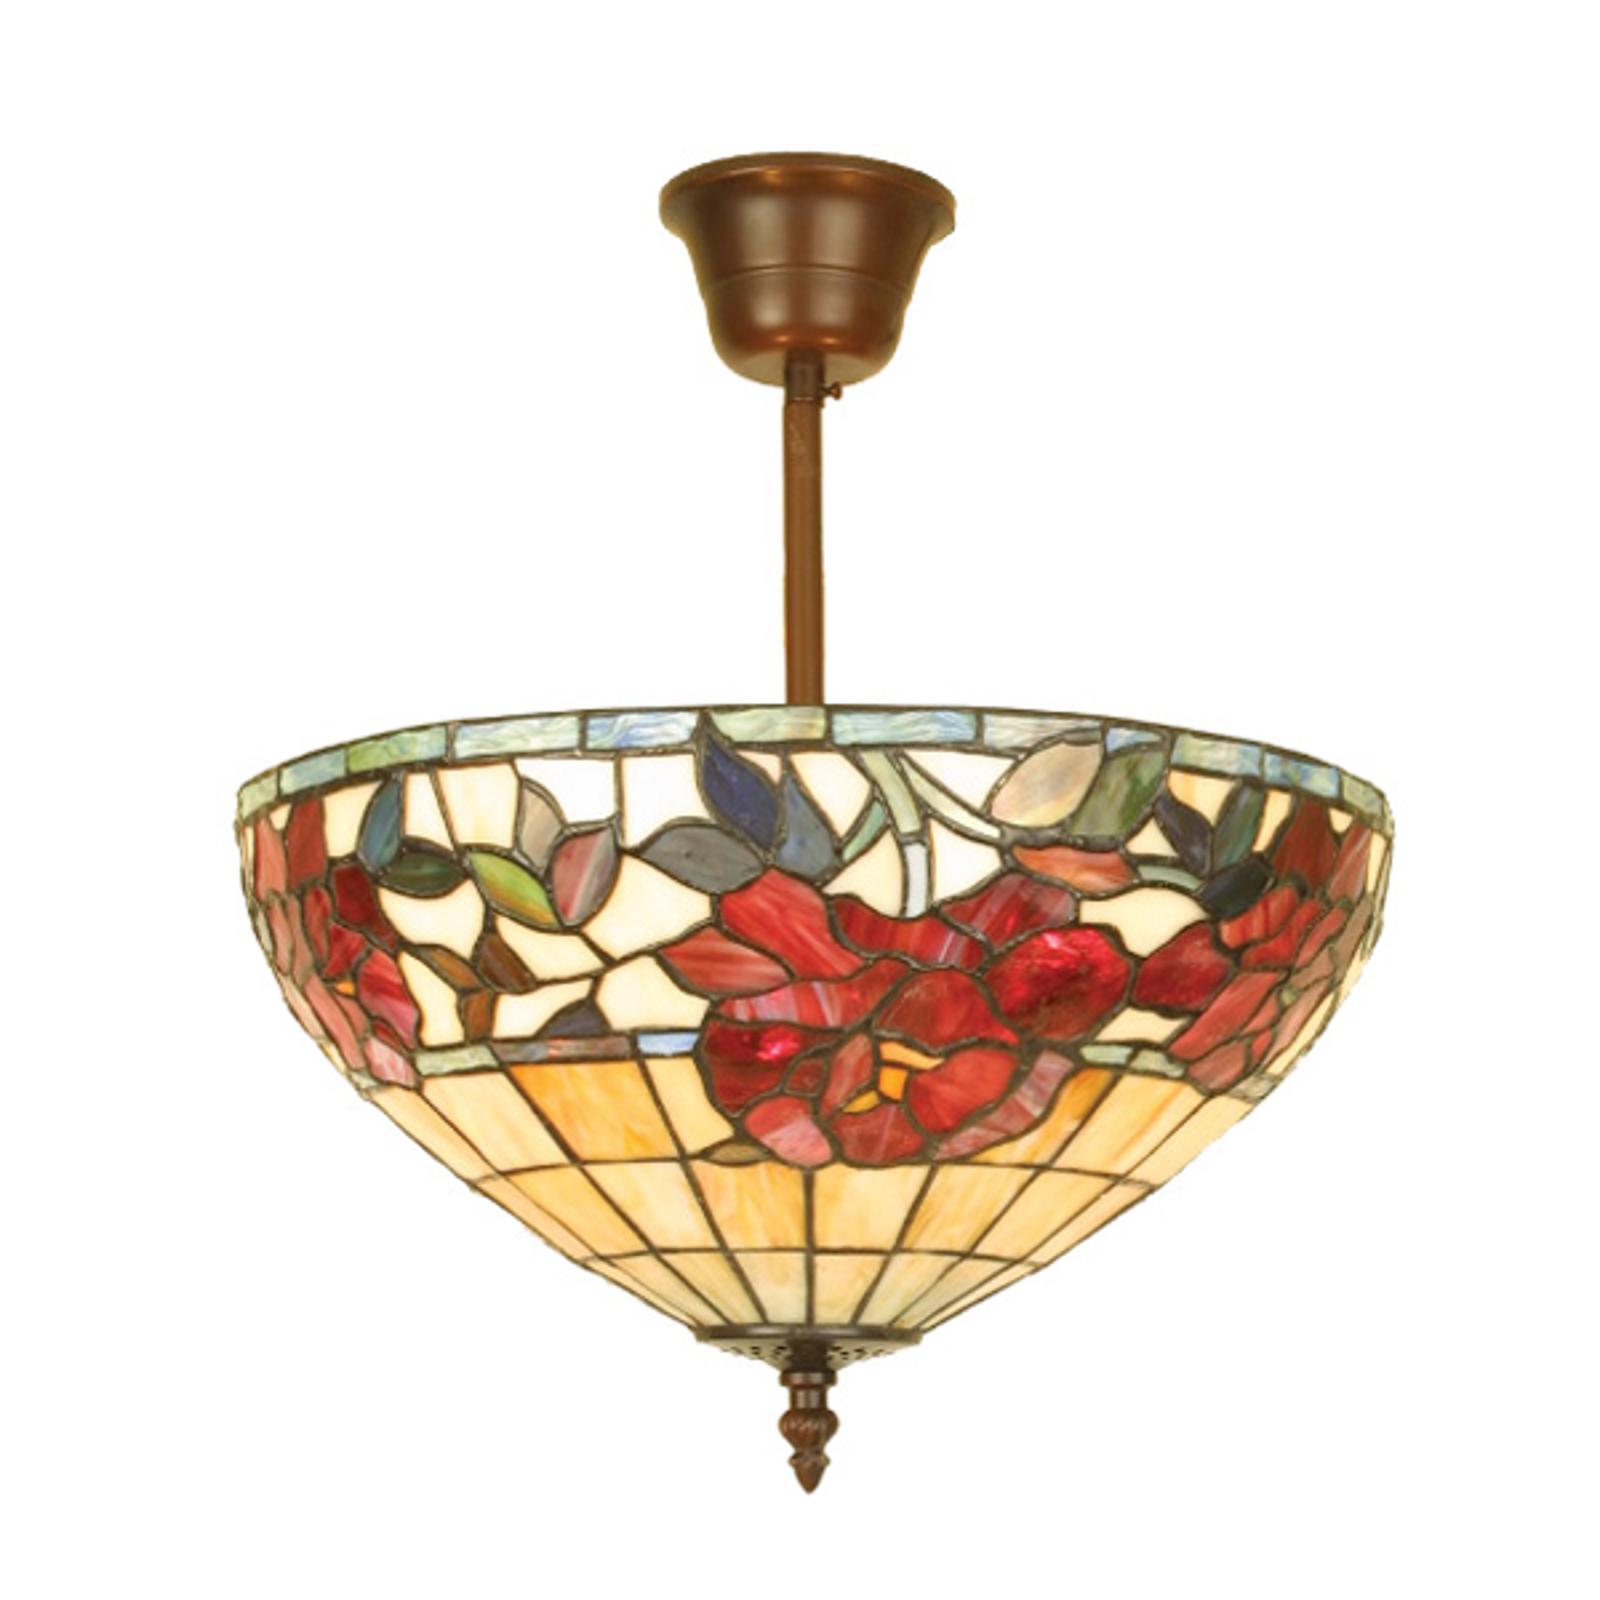 Lampa sufitowa Finna w stylu Tiffany